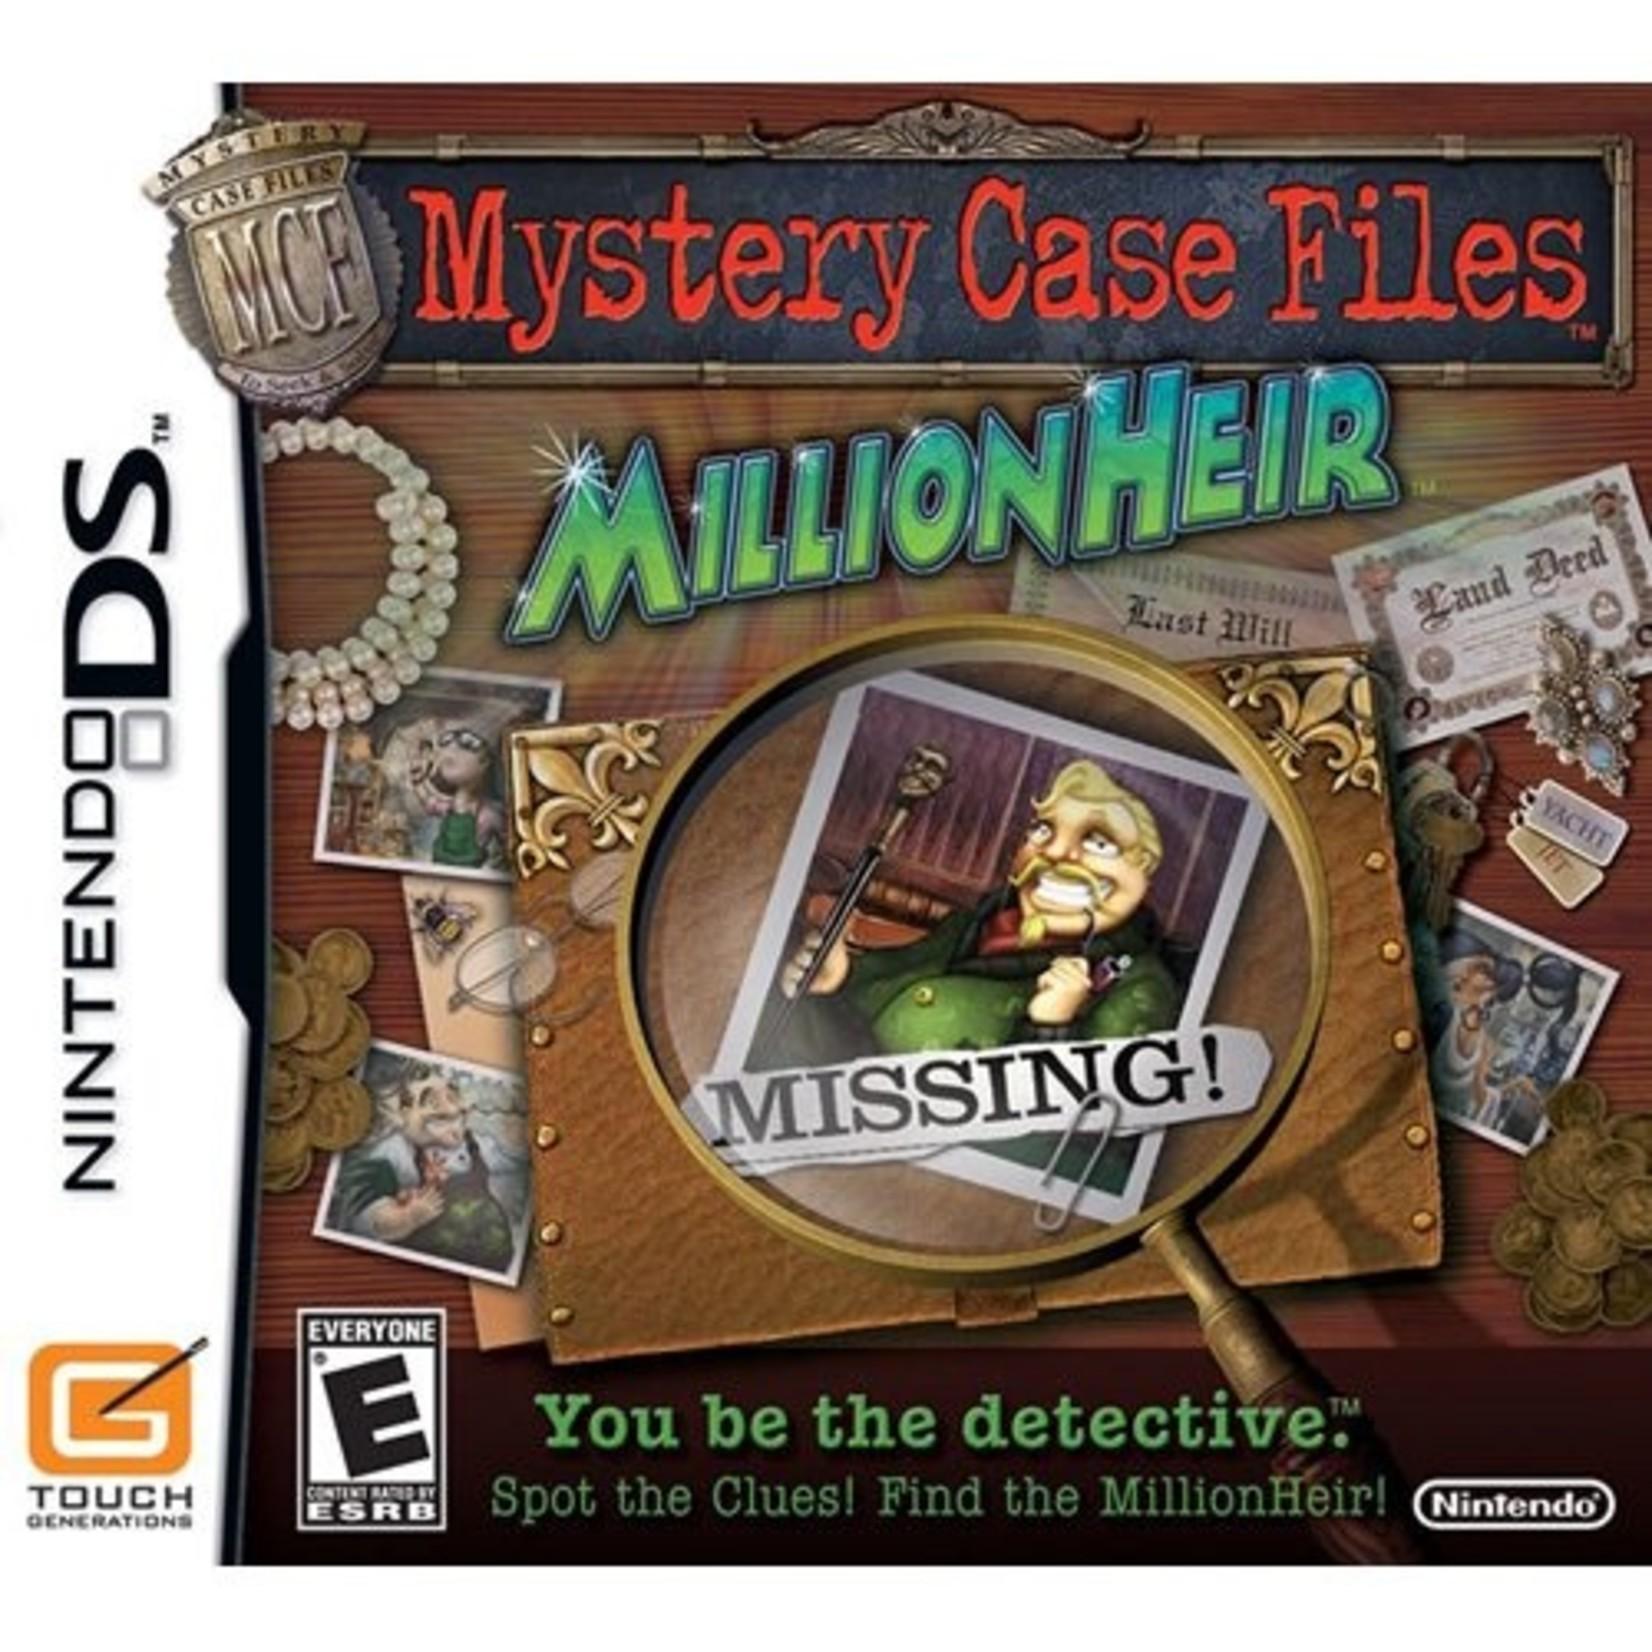 DSU-MYSTERY CASE FILES MILLIONHEIR